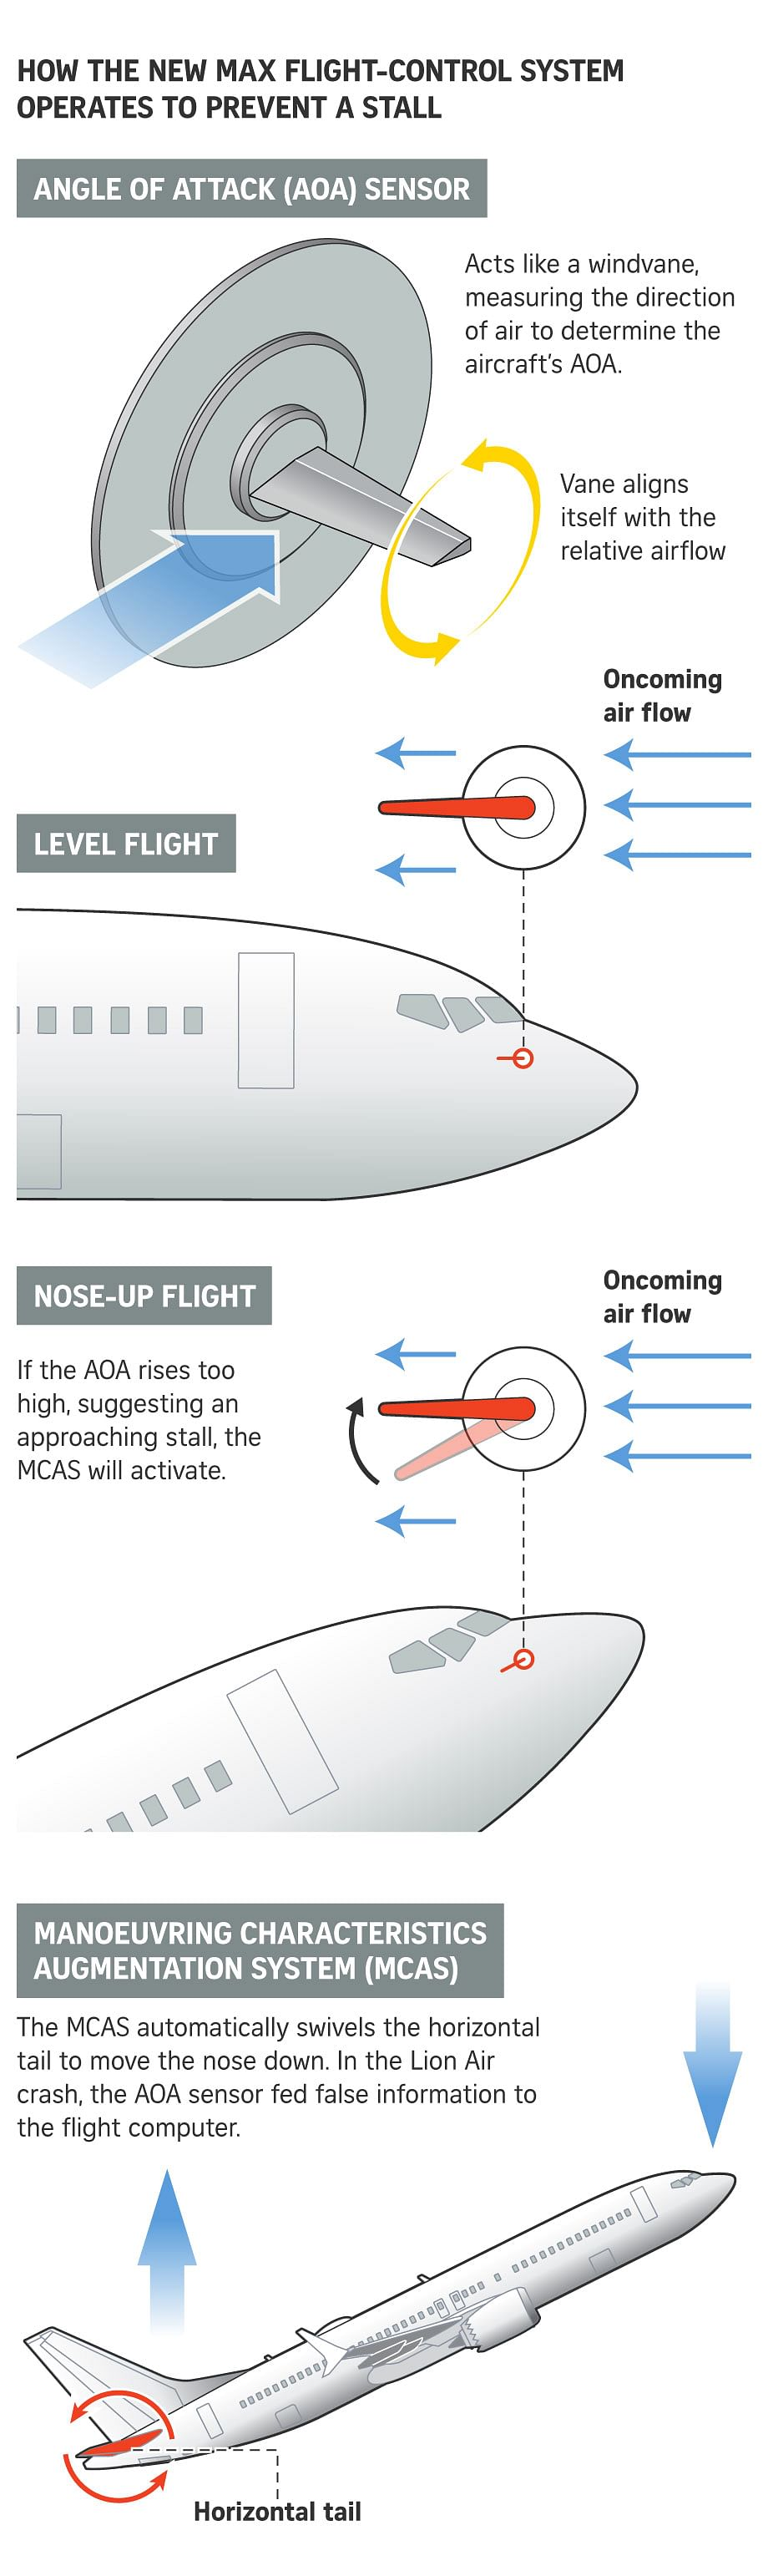 Ethiopian crash involving Boeing 737 Max 8: 6 things to know